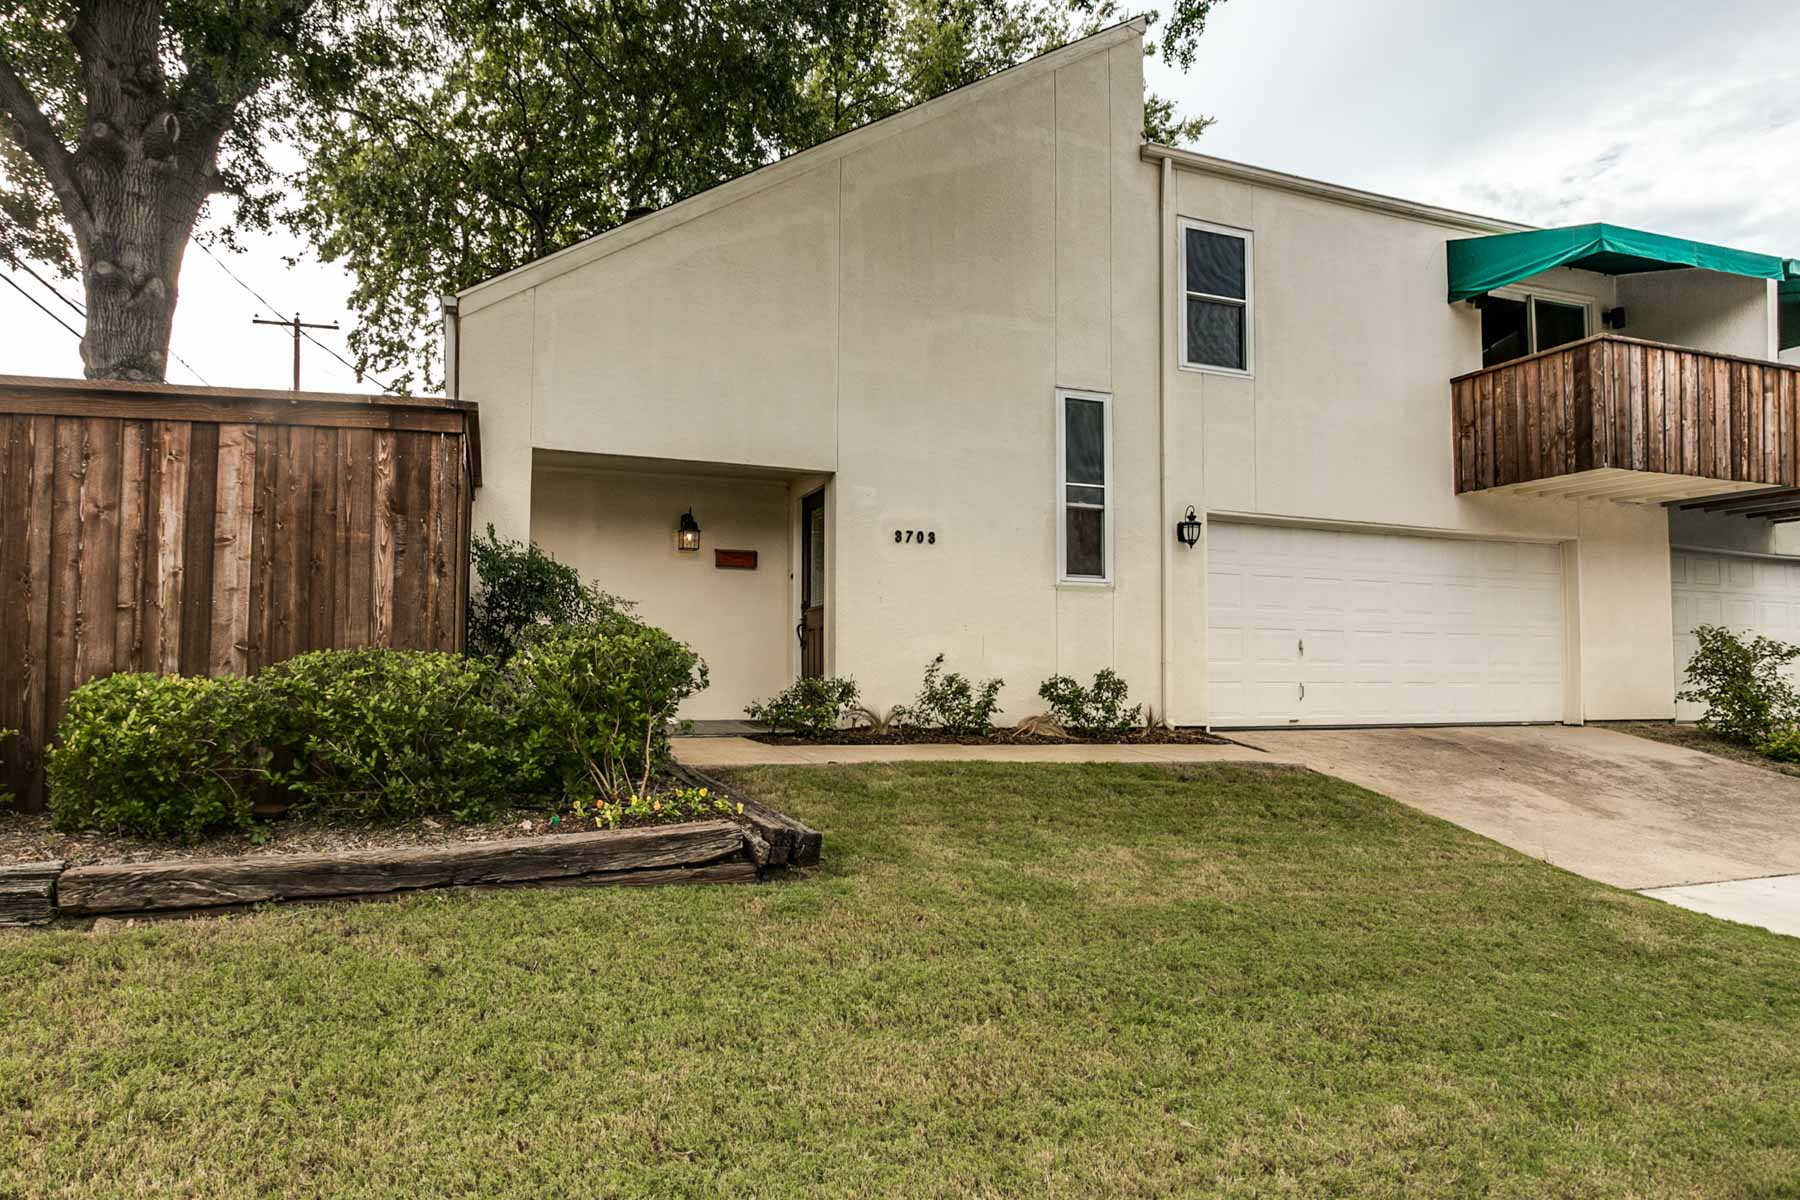 Moradia para Venda às Eclectic Monticello Duplex 3703 W 5th St Fort Worth, Texas, 76107 Estados Unidos